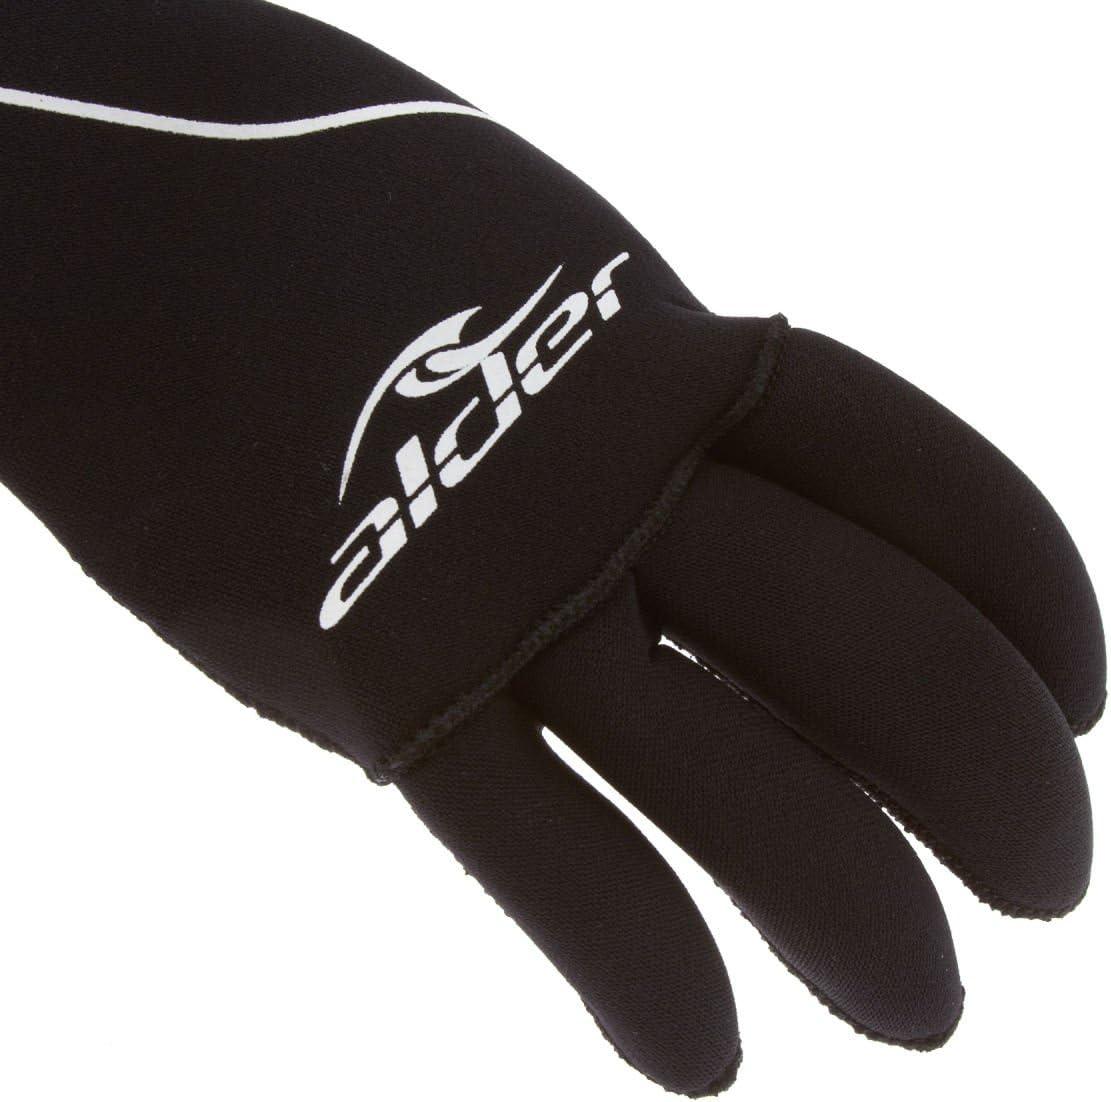 Alder Junior Edge Wetsuit Gloves in Black 5 Finger Wetsuit Gloves